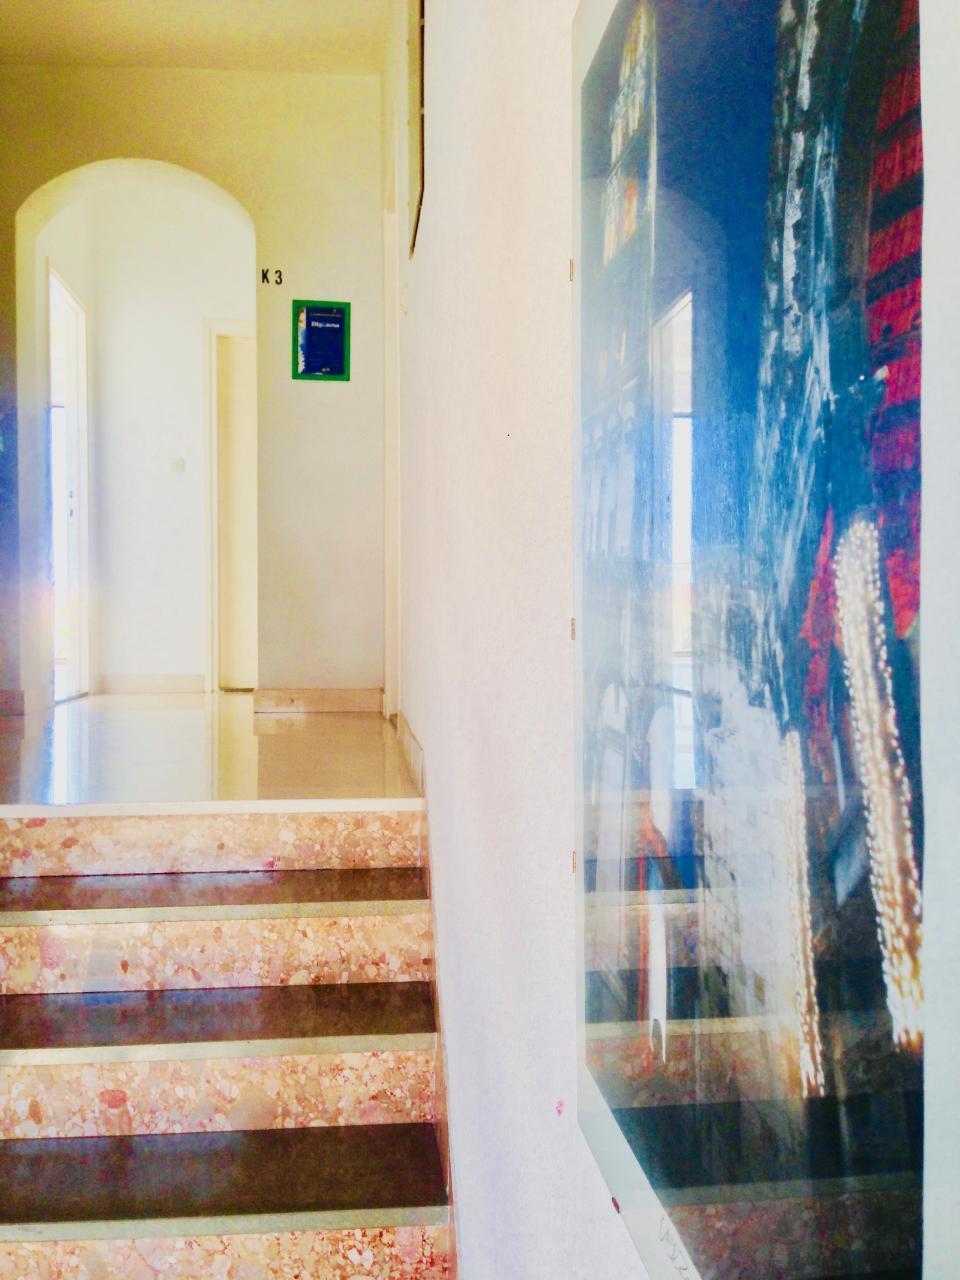 Ferienwohnung Apartmenthaus Ruza 7 - Studio (98388), Kaštel Štafilić, , Dalmatien, Kroatien, Bild 23